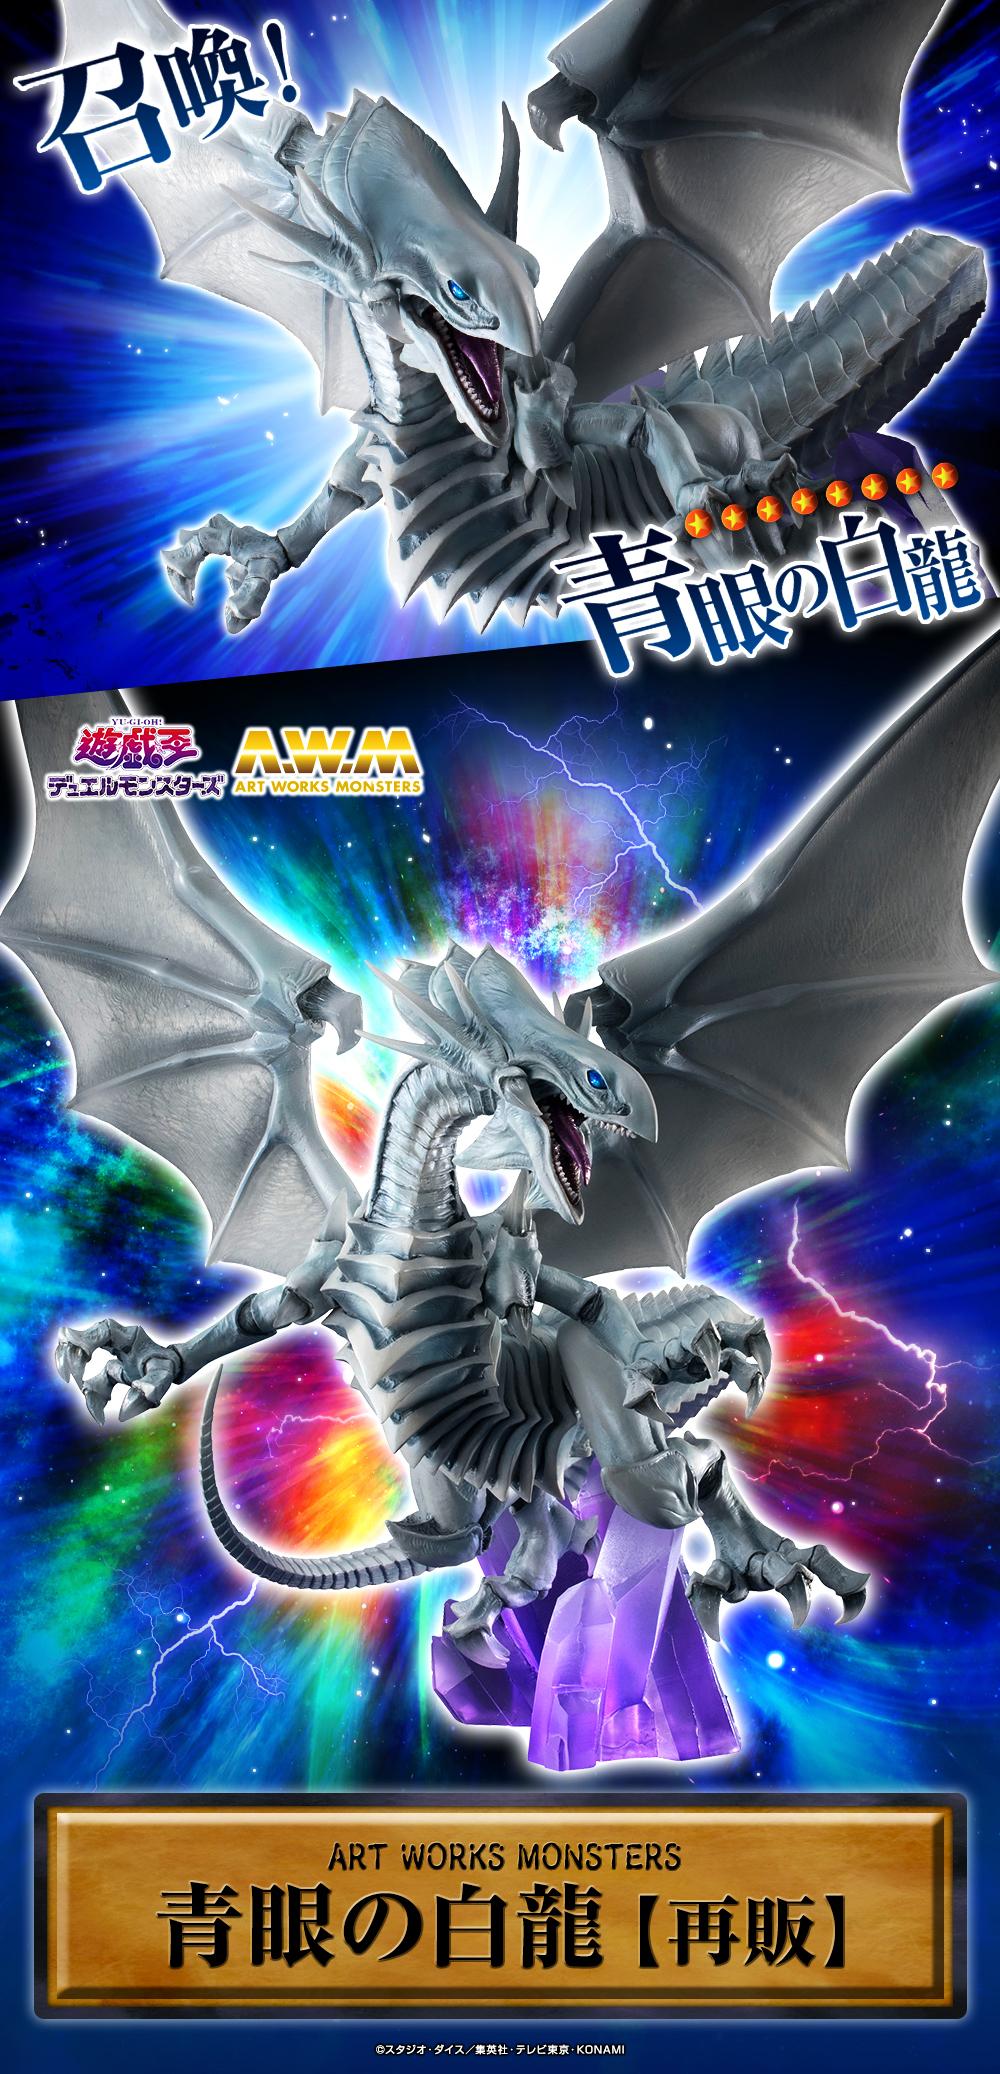 ART WORKS MONSTERS Yu-Gi-Oh Duel Monsters Blue Eyed White Dragon [repeat].jpg